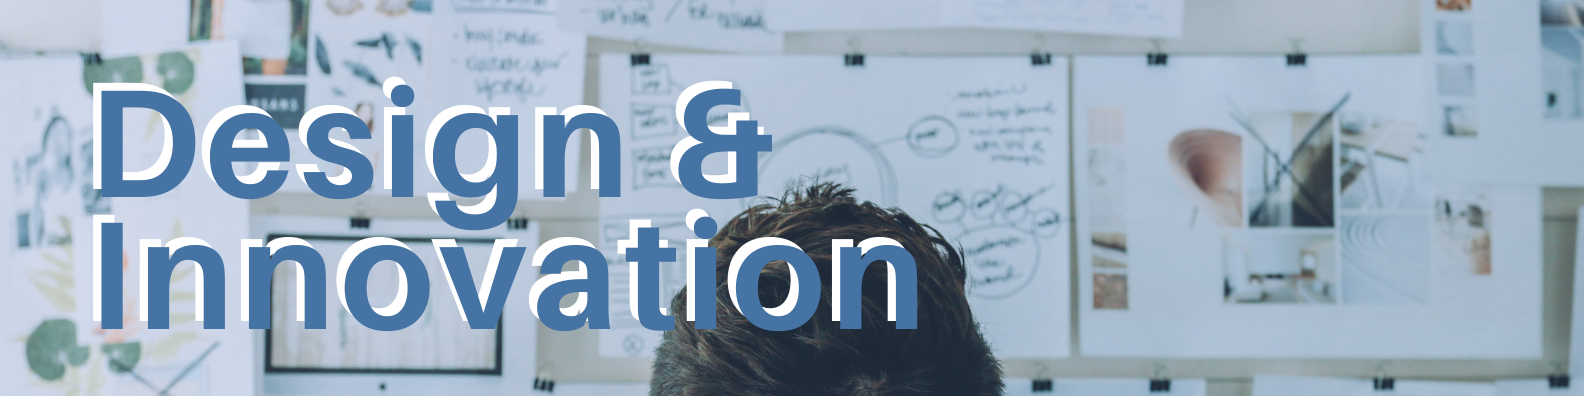 Design and Innovation banner